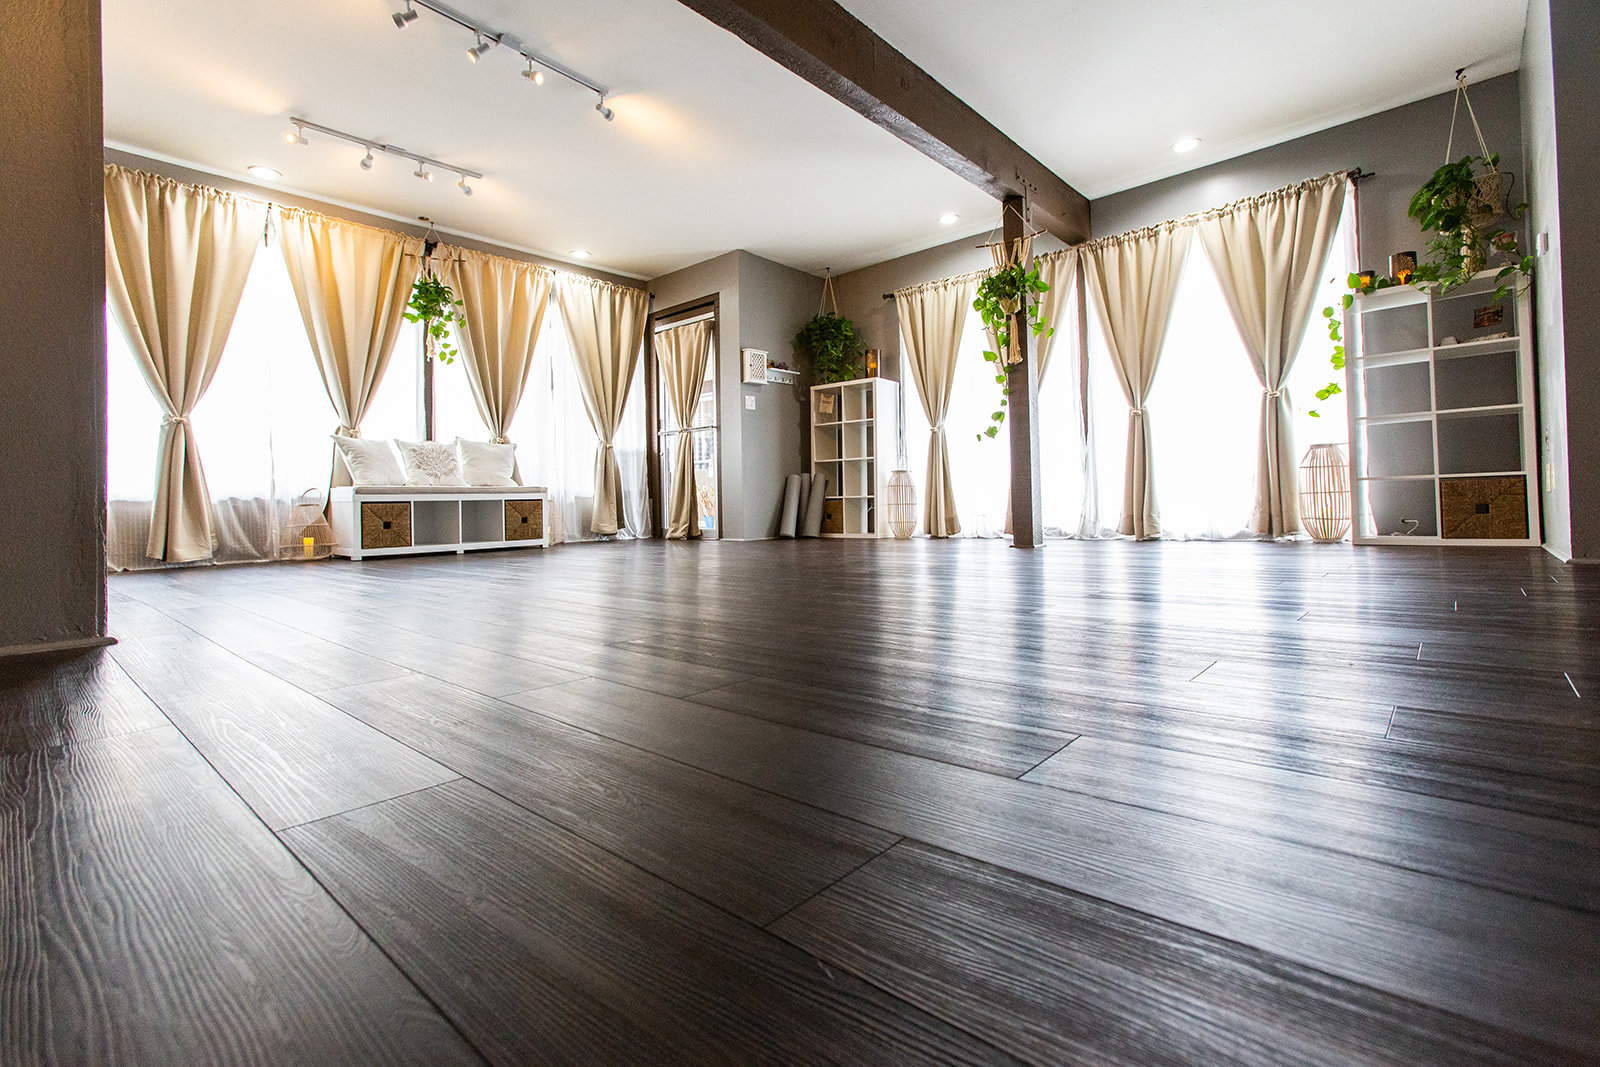 Sun Room Studio Rental Weekdays per hour